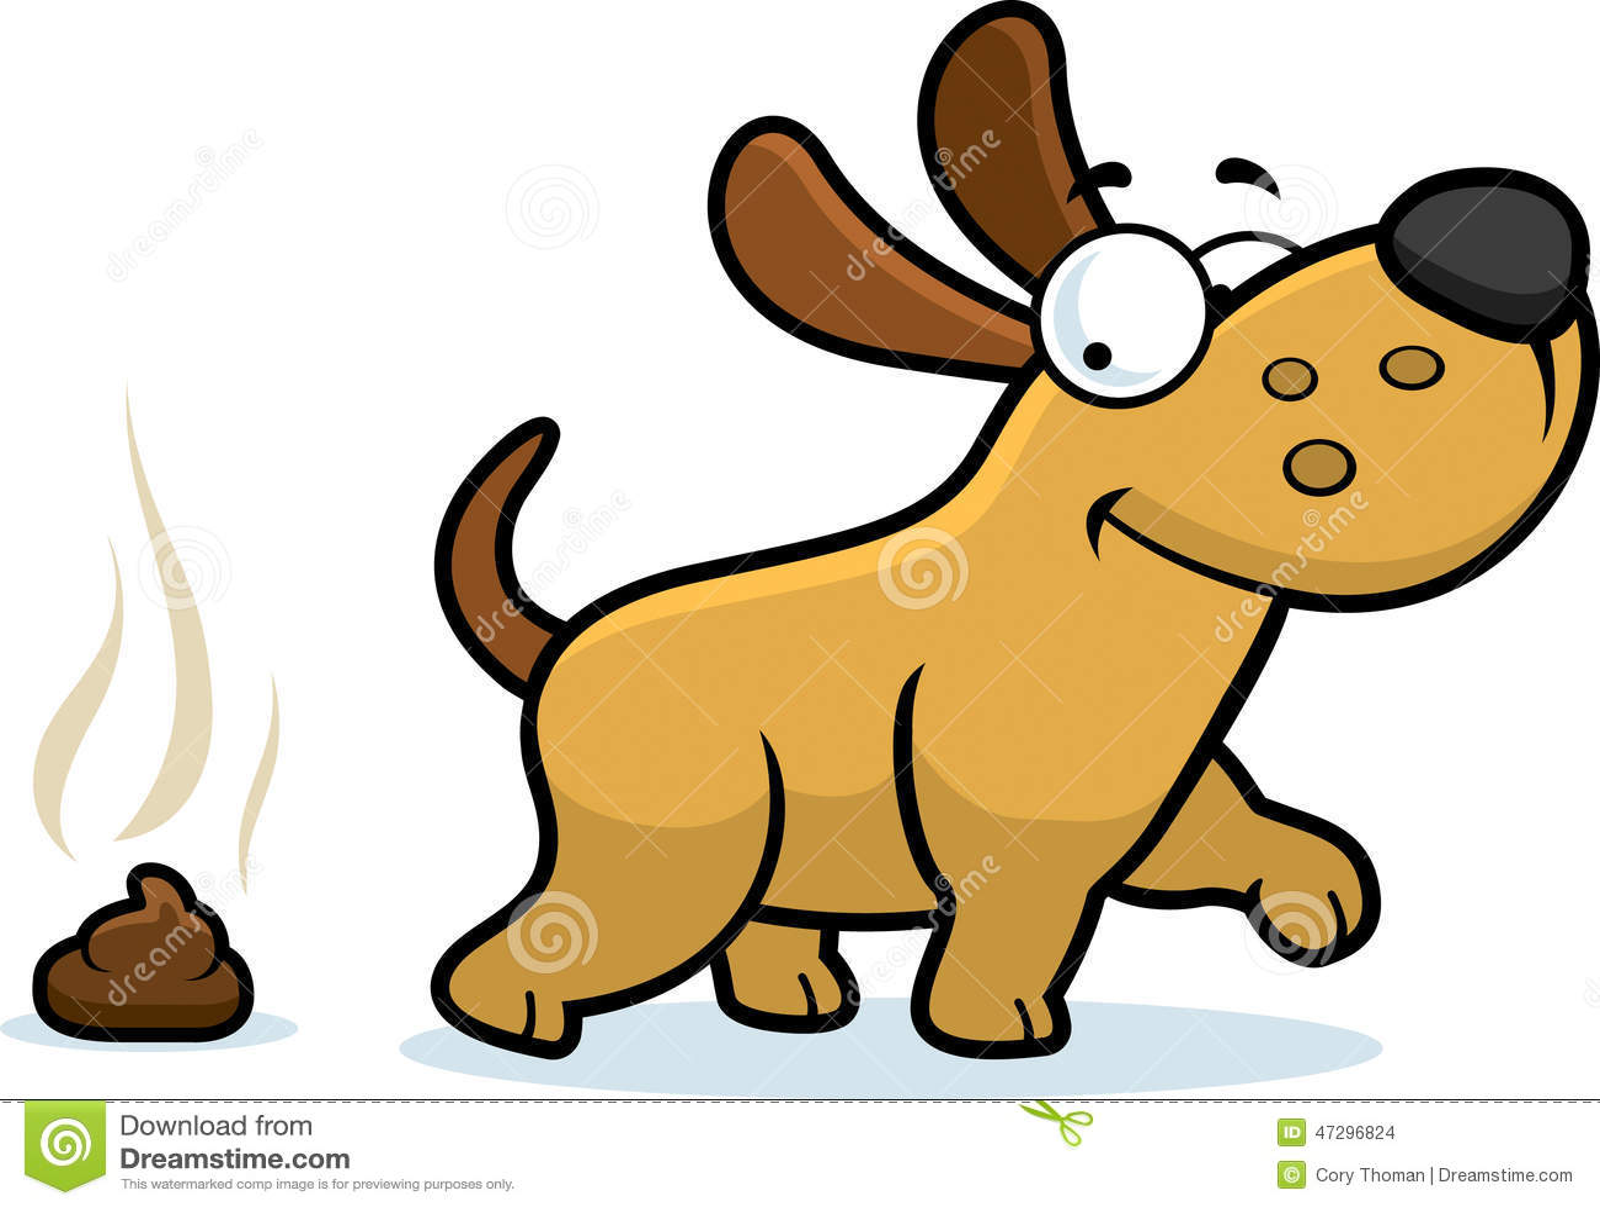 Dogs Eating Human Poop Porn Videos